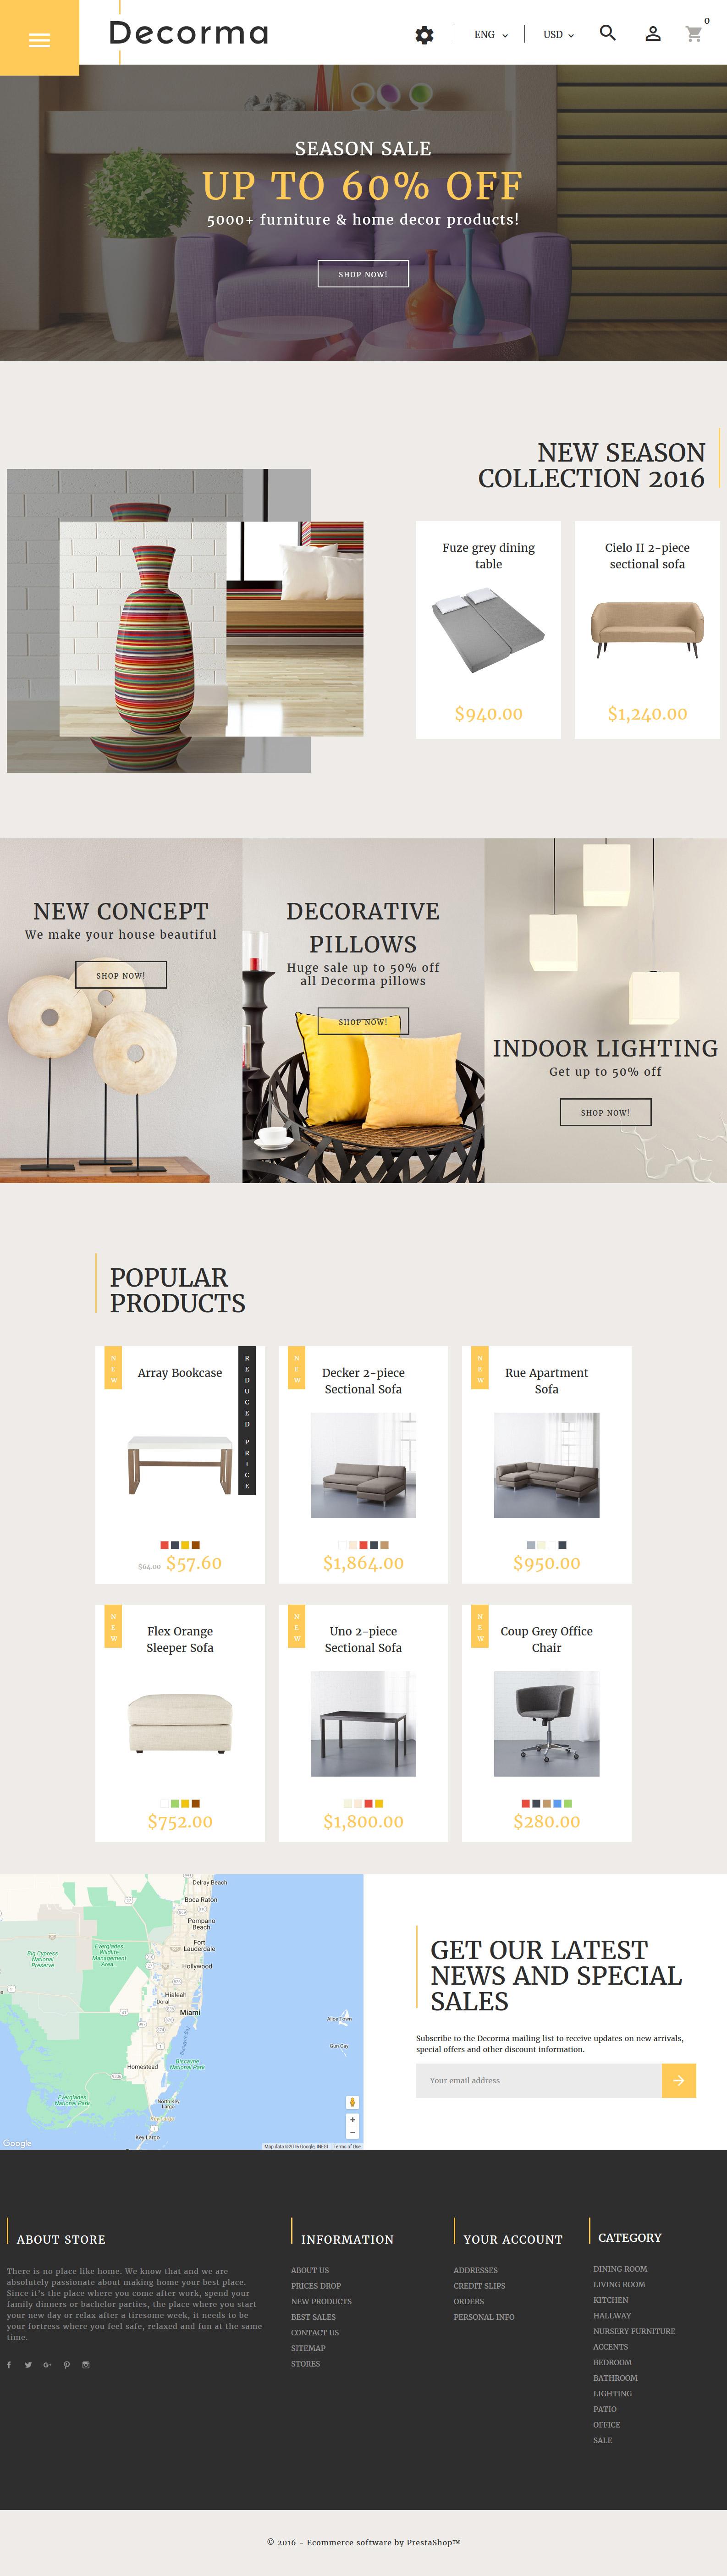 """Decorma - Furniture Responsive"" - адаптивний PrestaShop шаблон №61231 - скріншот"